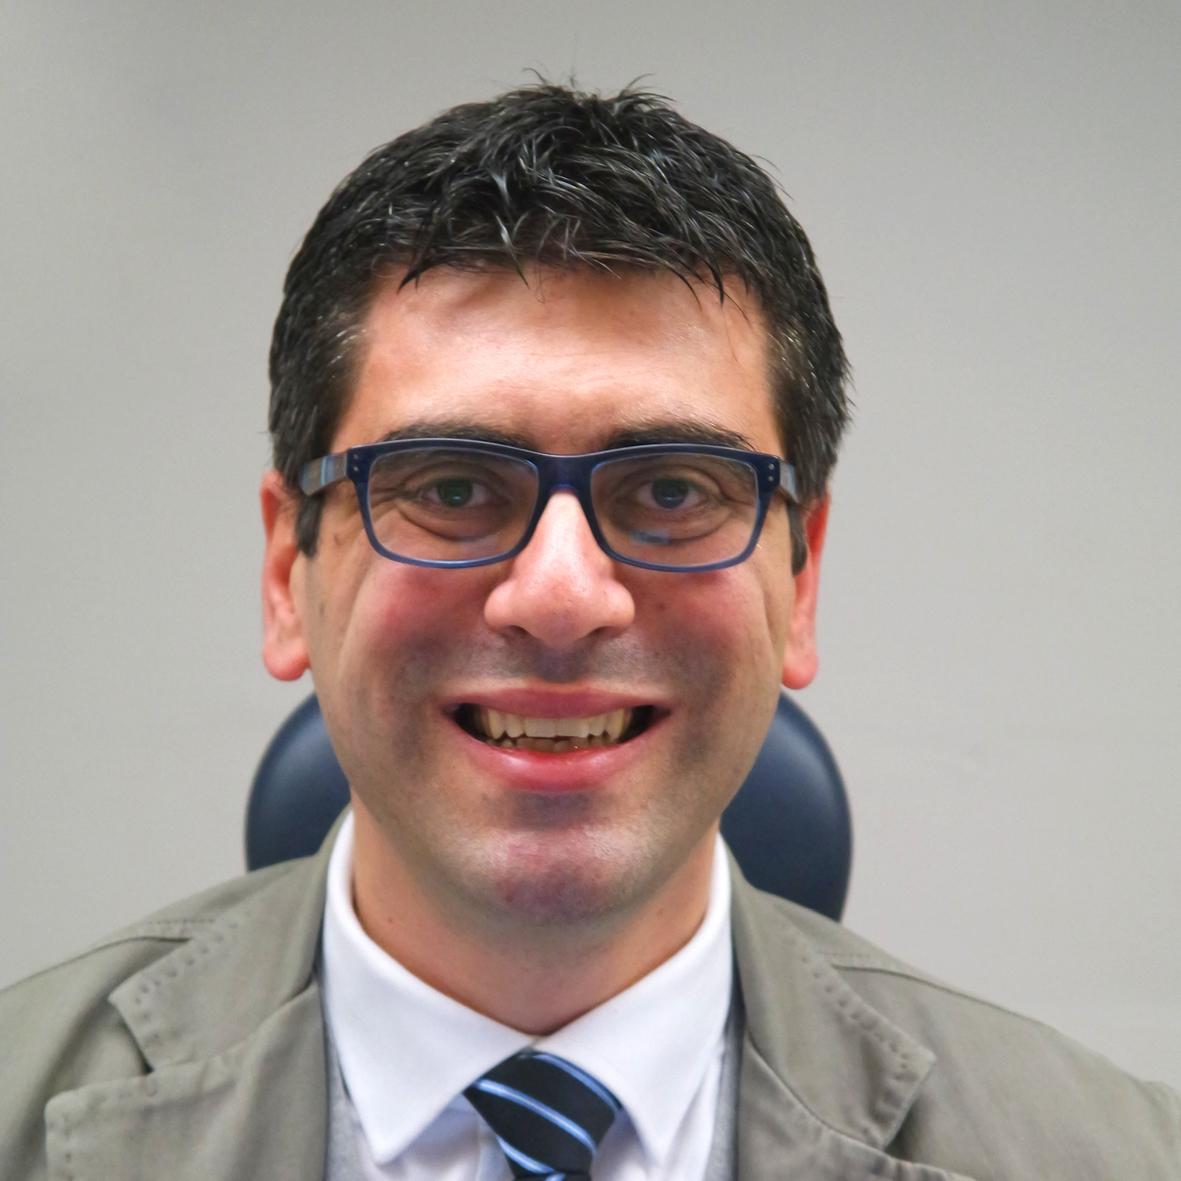 Antonio Viviano